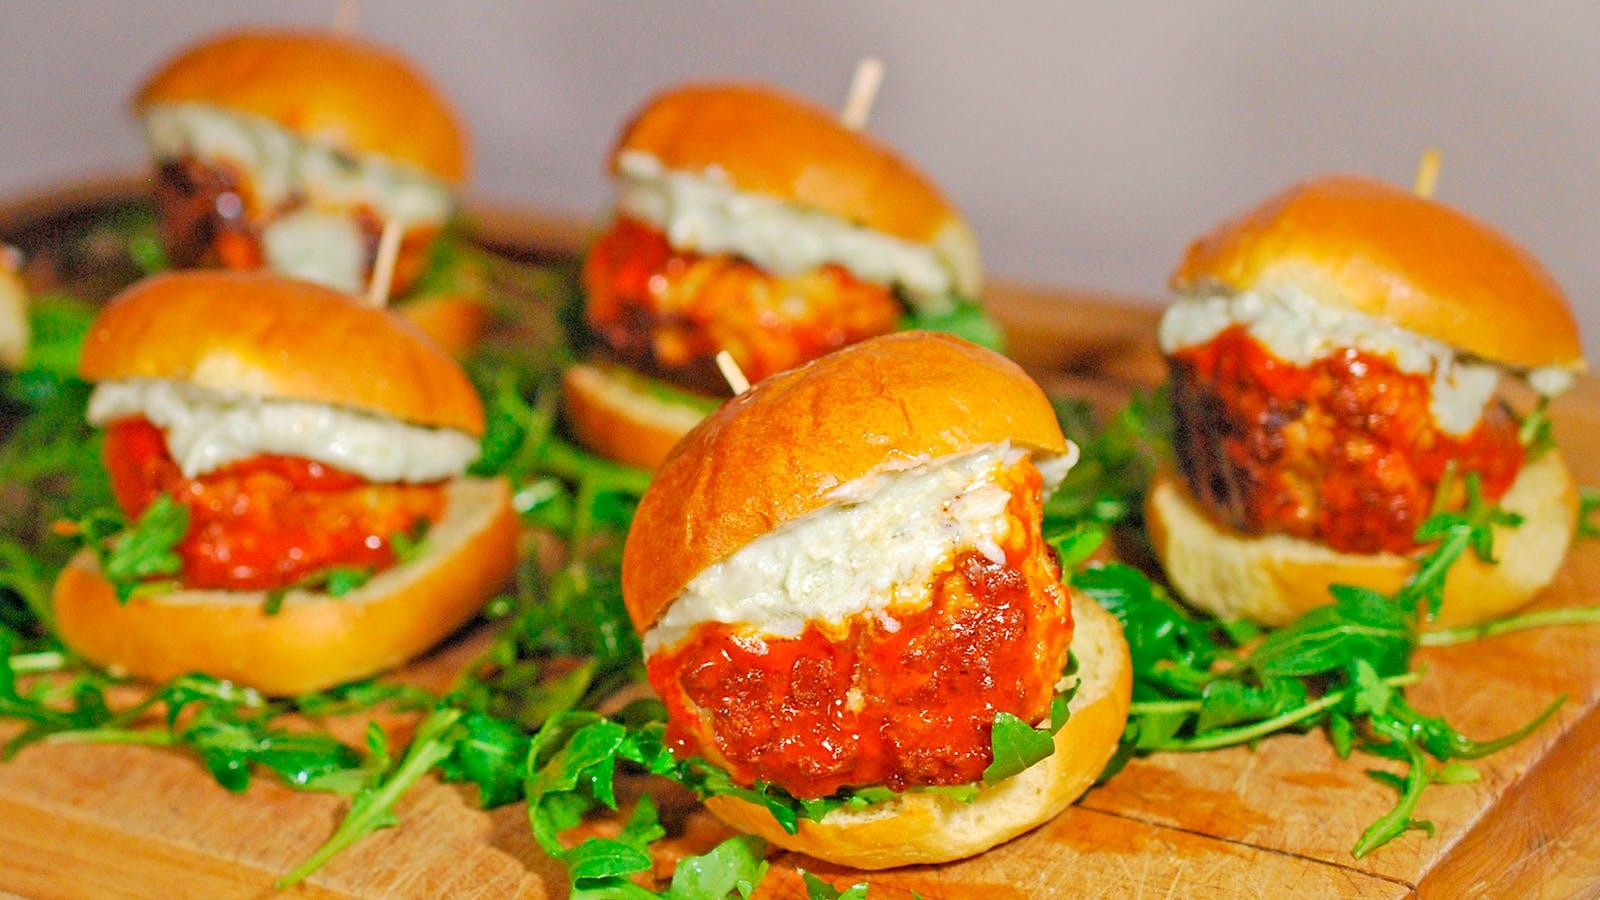 8 & $20: Buffalo Chicken Meatball Sliders